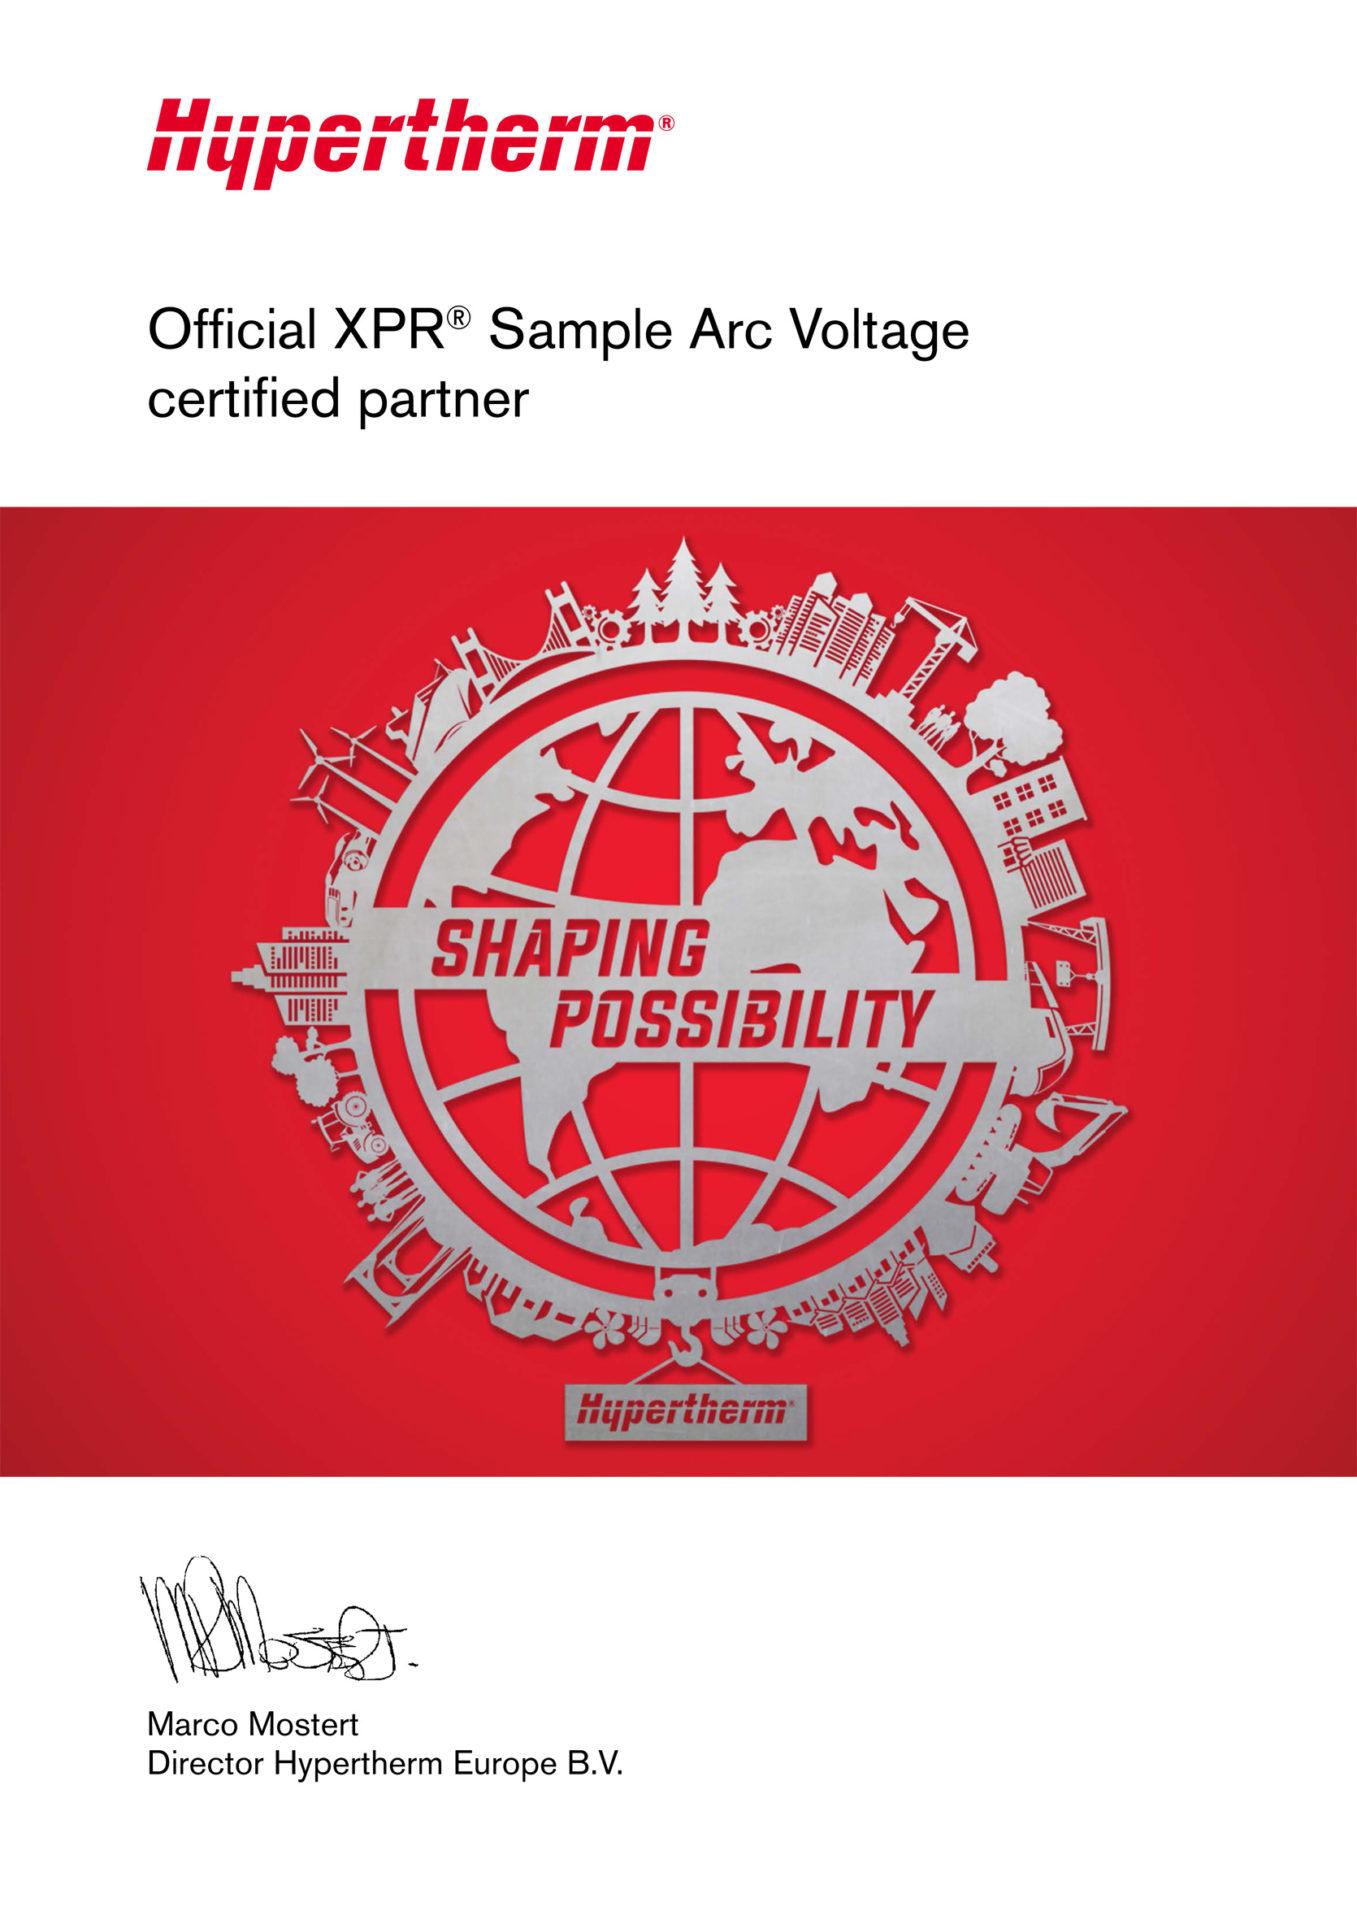 Hypertherm sample arc voltage